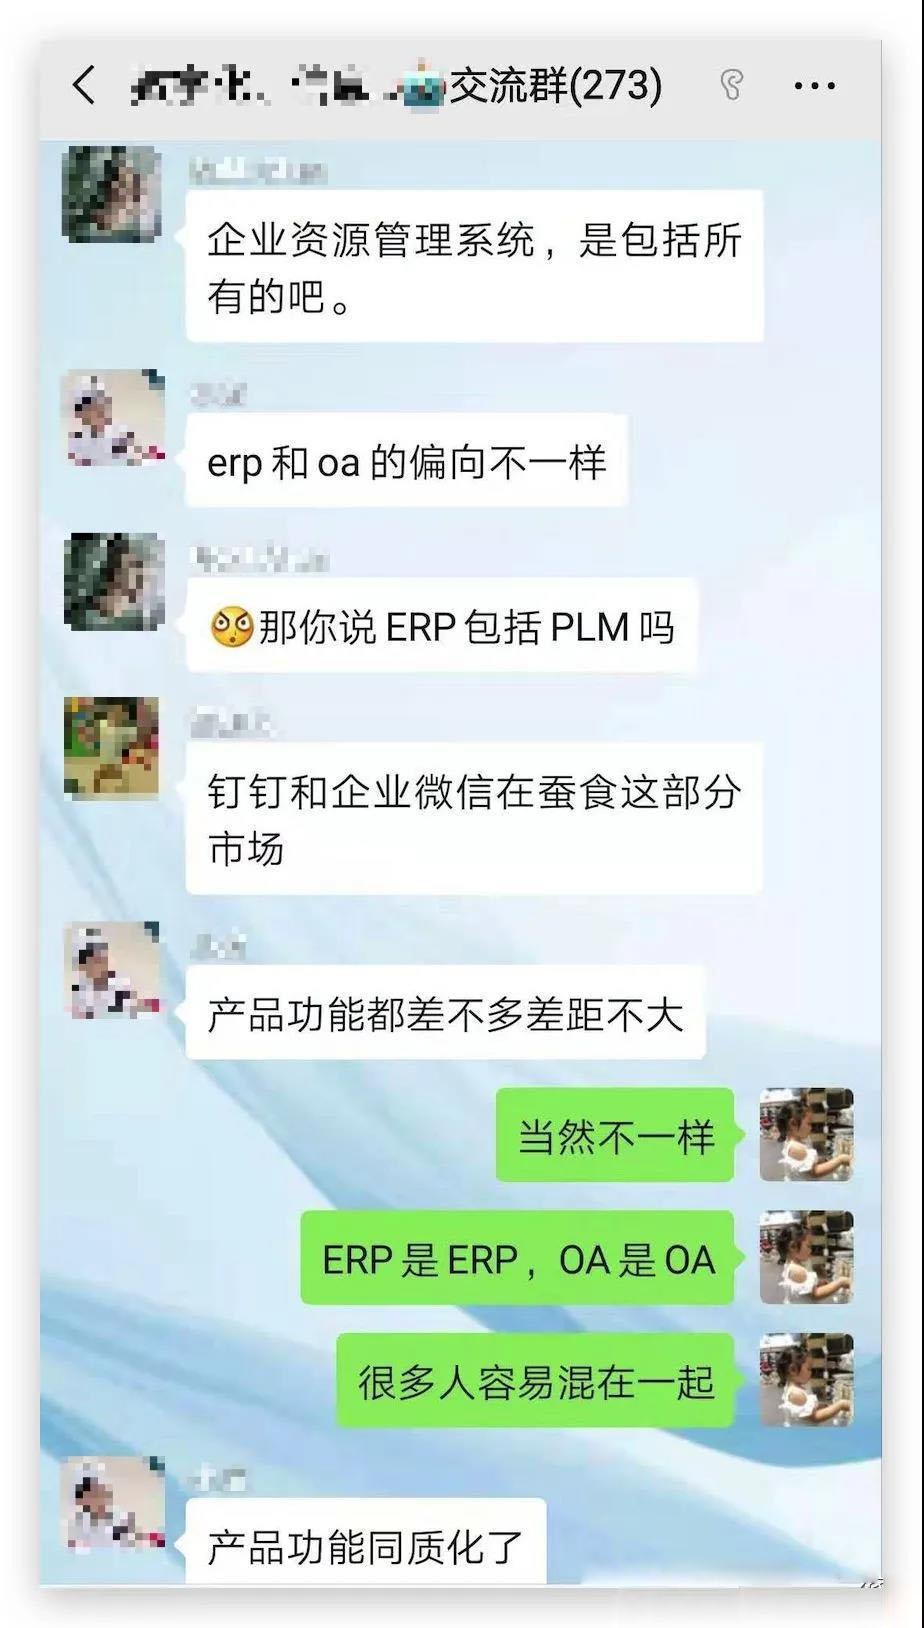 ERP系统包含OA吗? 图1